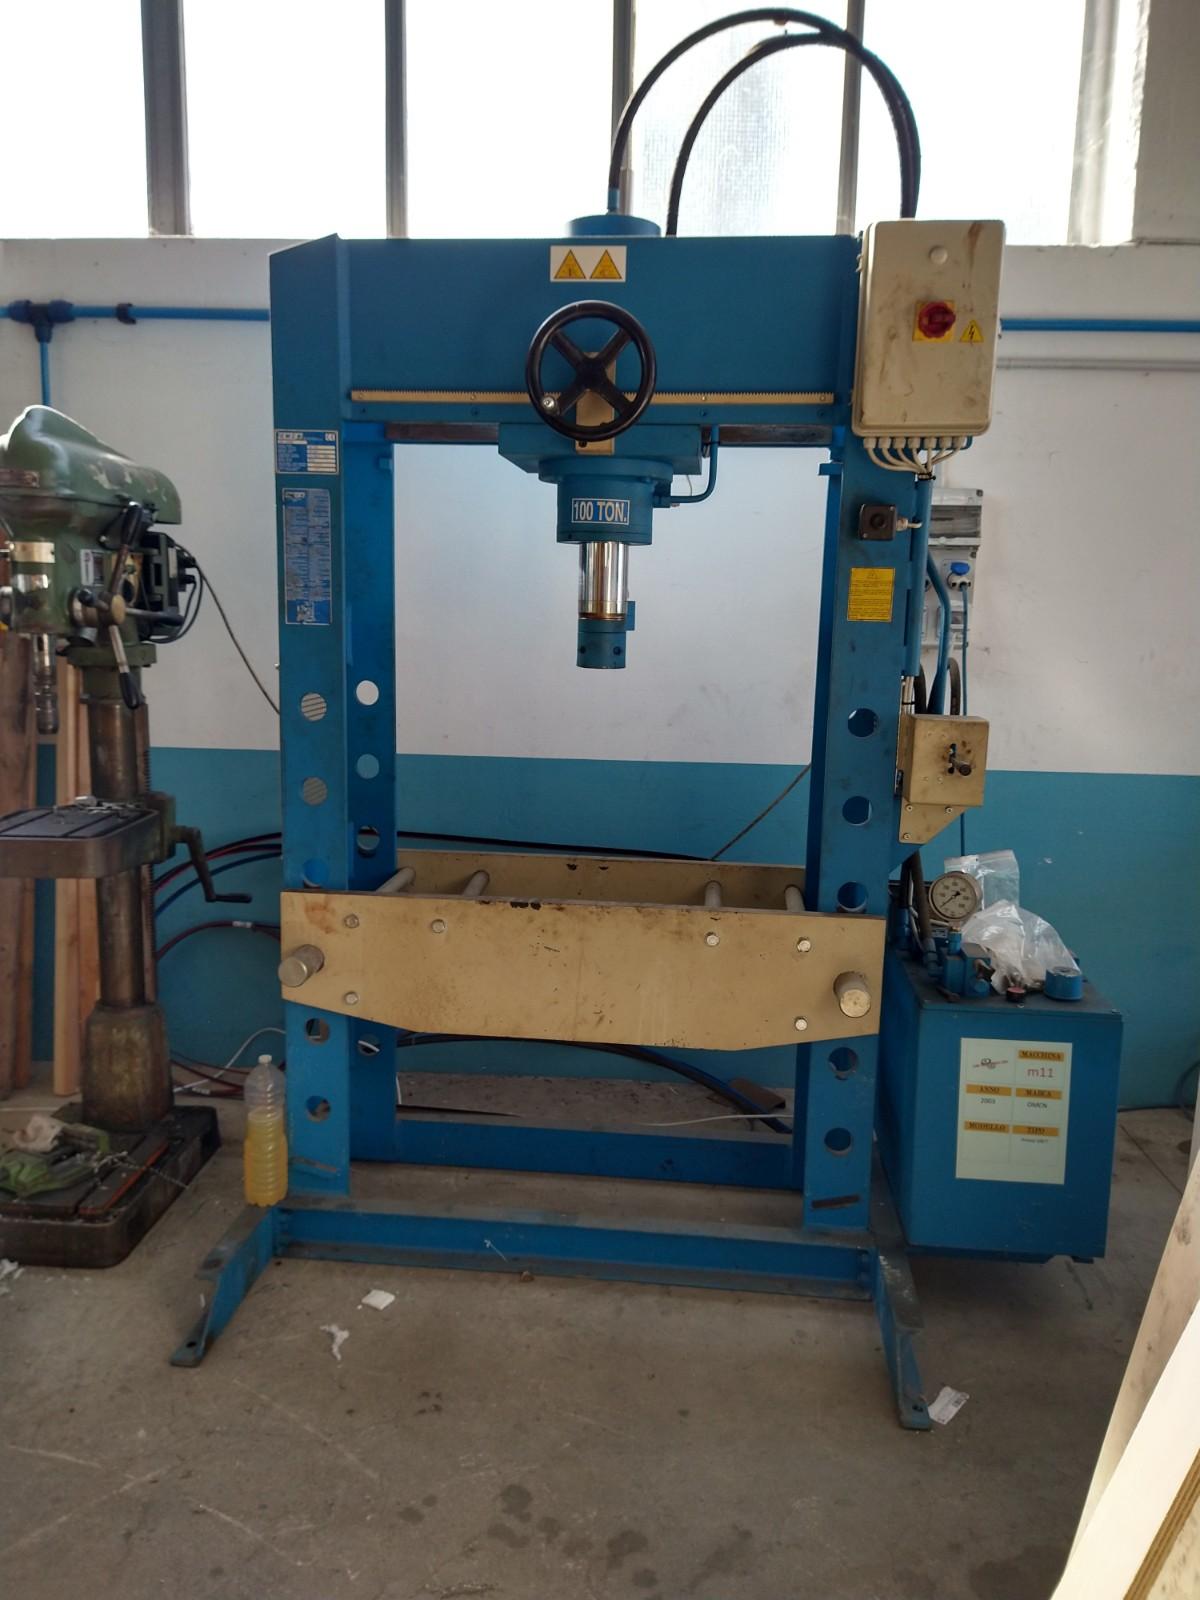 Pressa Oleodinamica OMCN 100 Ton